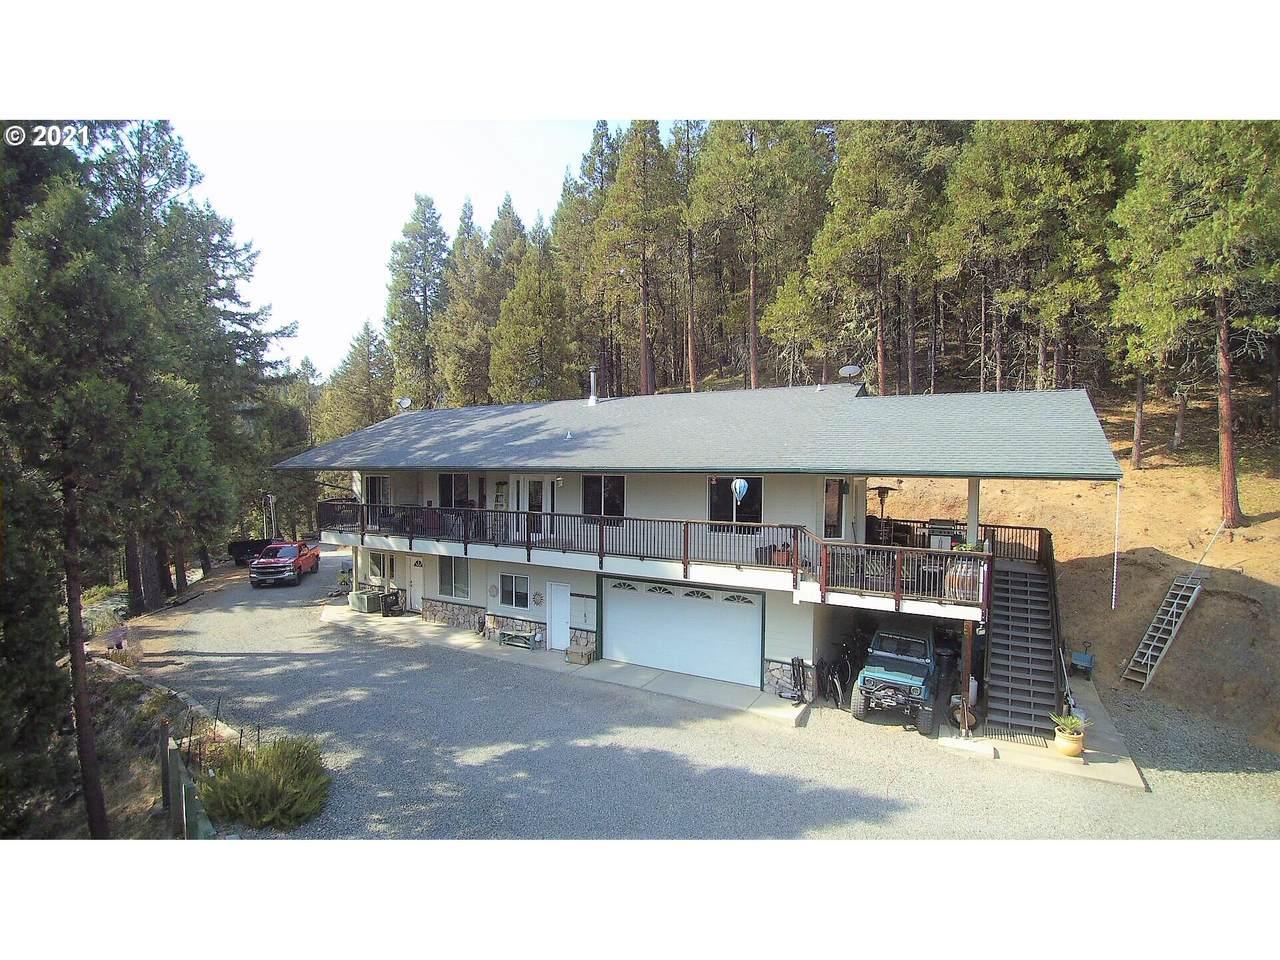 2121 Woods Creek Rd - Photo 1